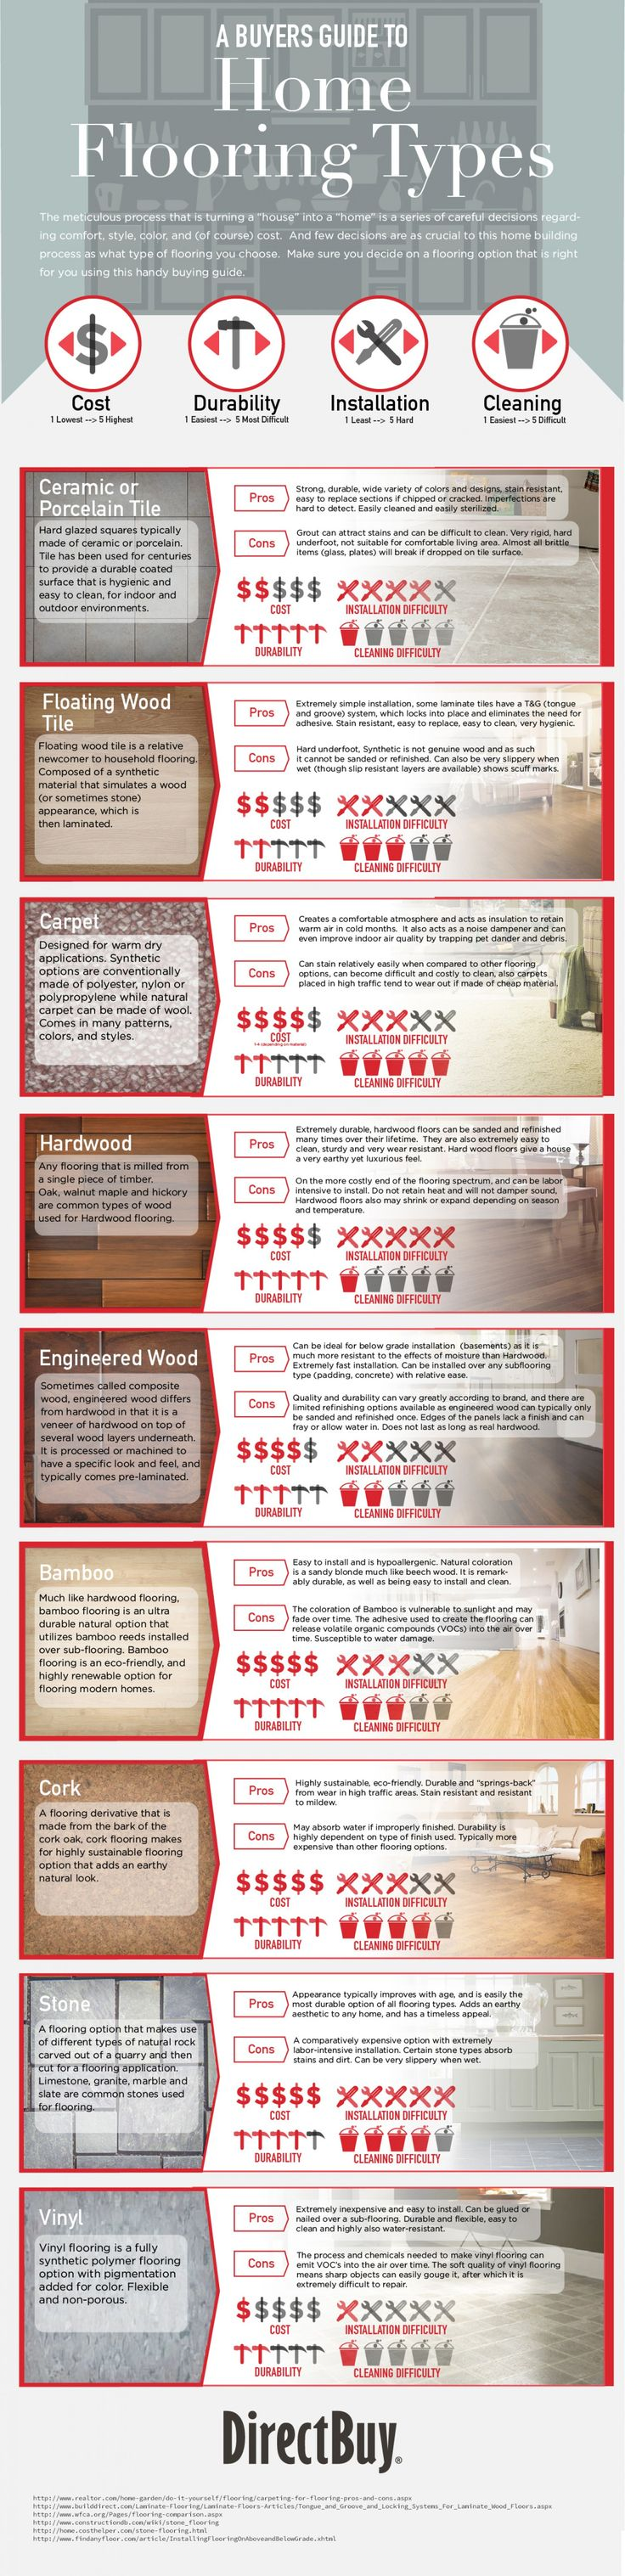 grey hardwood floors kitchen flooring types 25 best ideas about Grey Hardwood Floors on Pinterest Grey wood floors Grey flooring and Wood floor colors